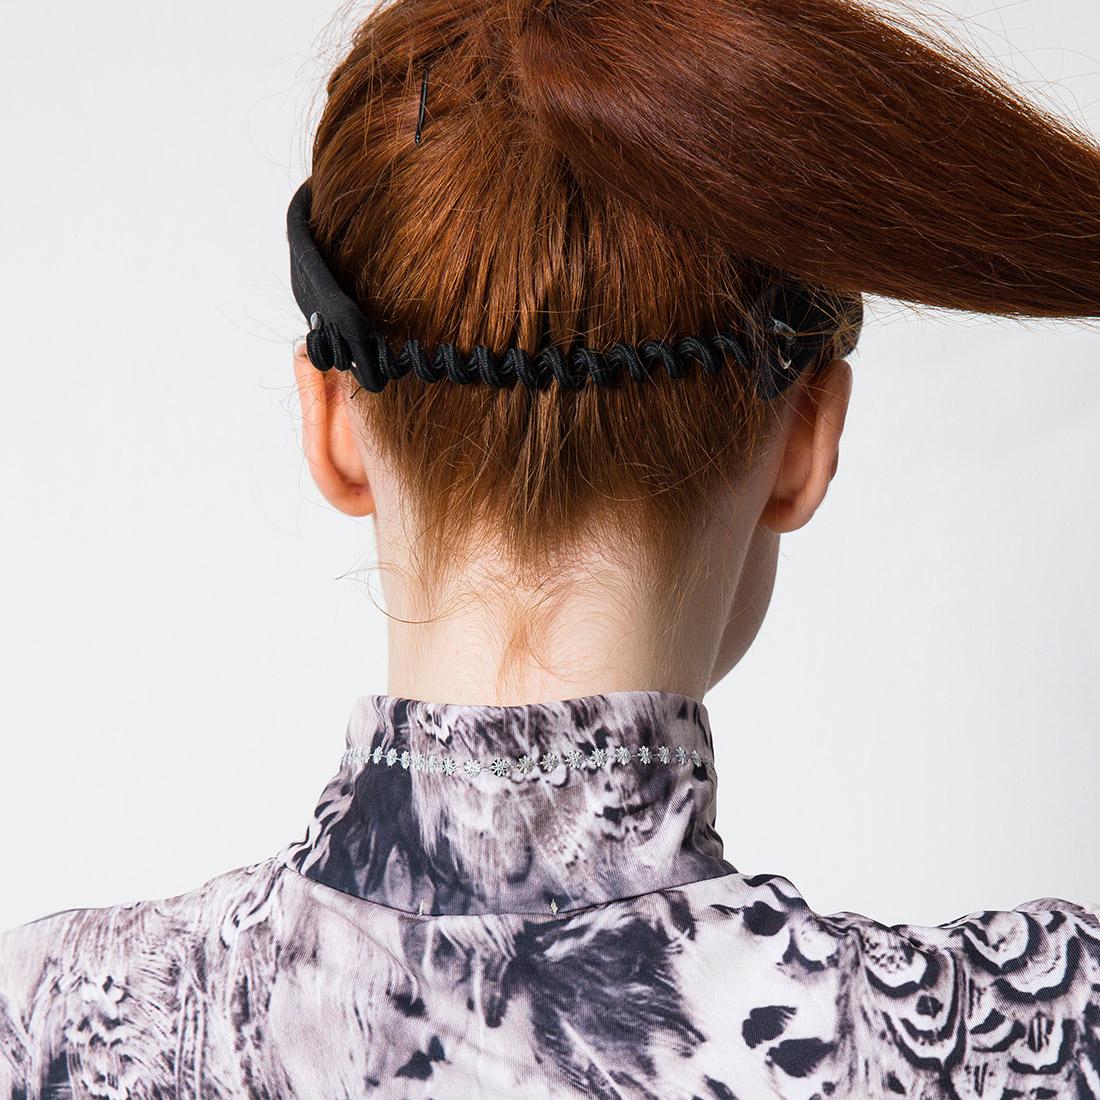 Damen Golf-Visor mit Black Feathers Print in Onesize